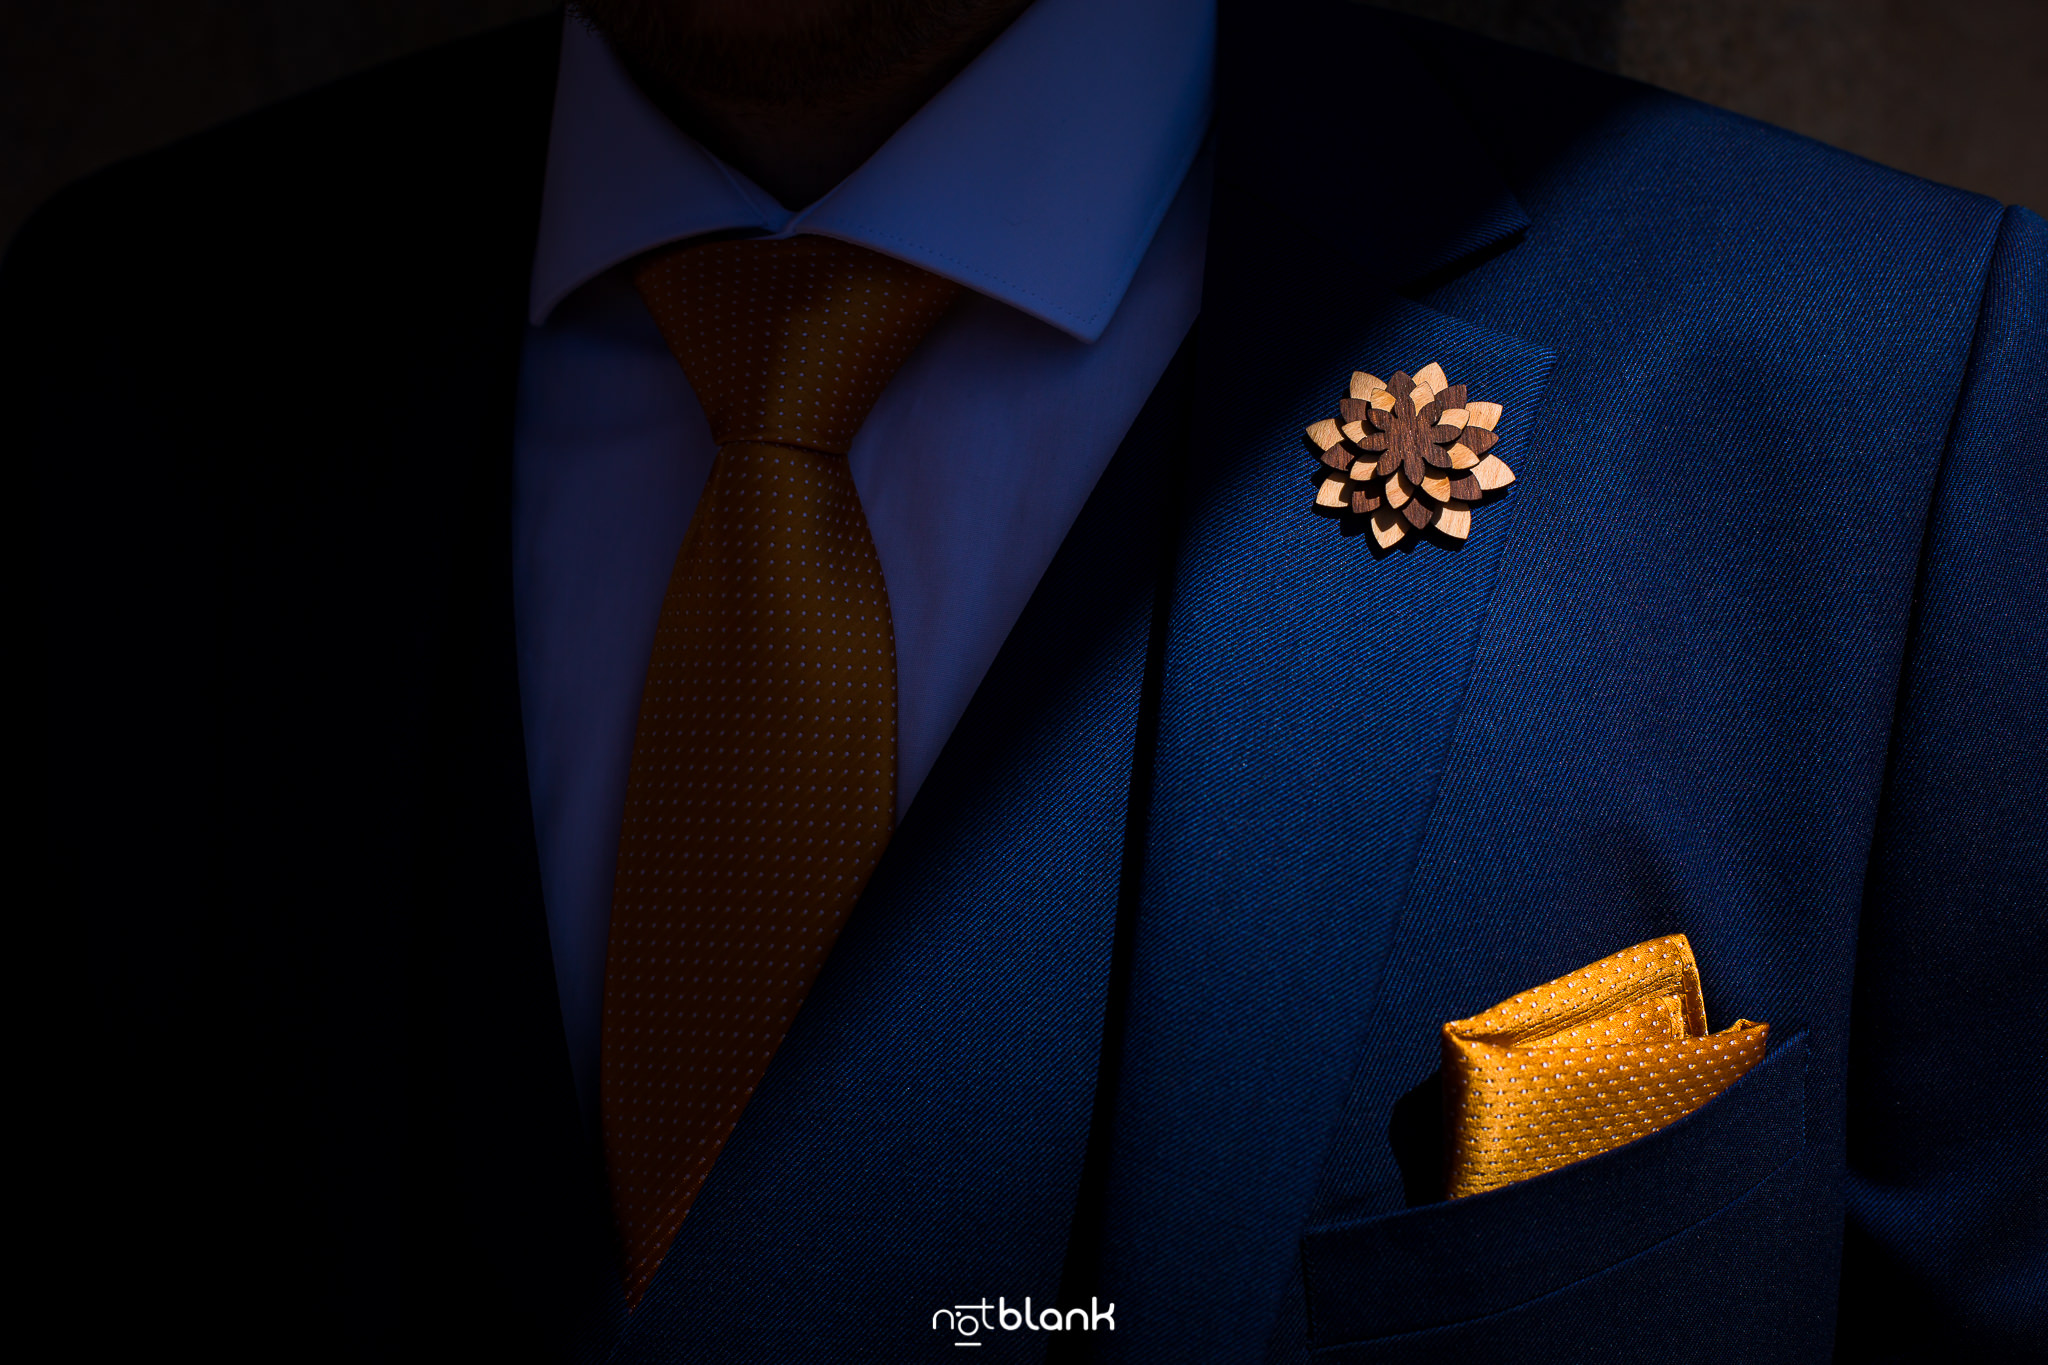 Boda-Maite-David-Flor-Botonier. Reportaje realizado por Notblank Fotografos de boda